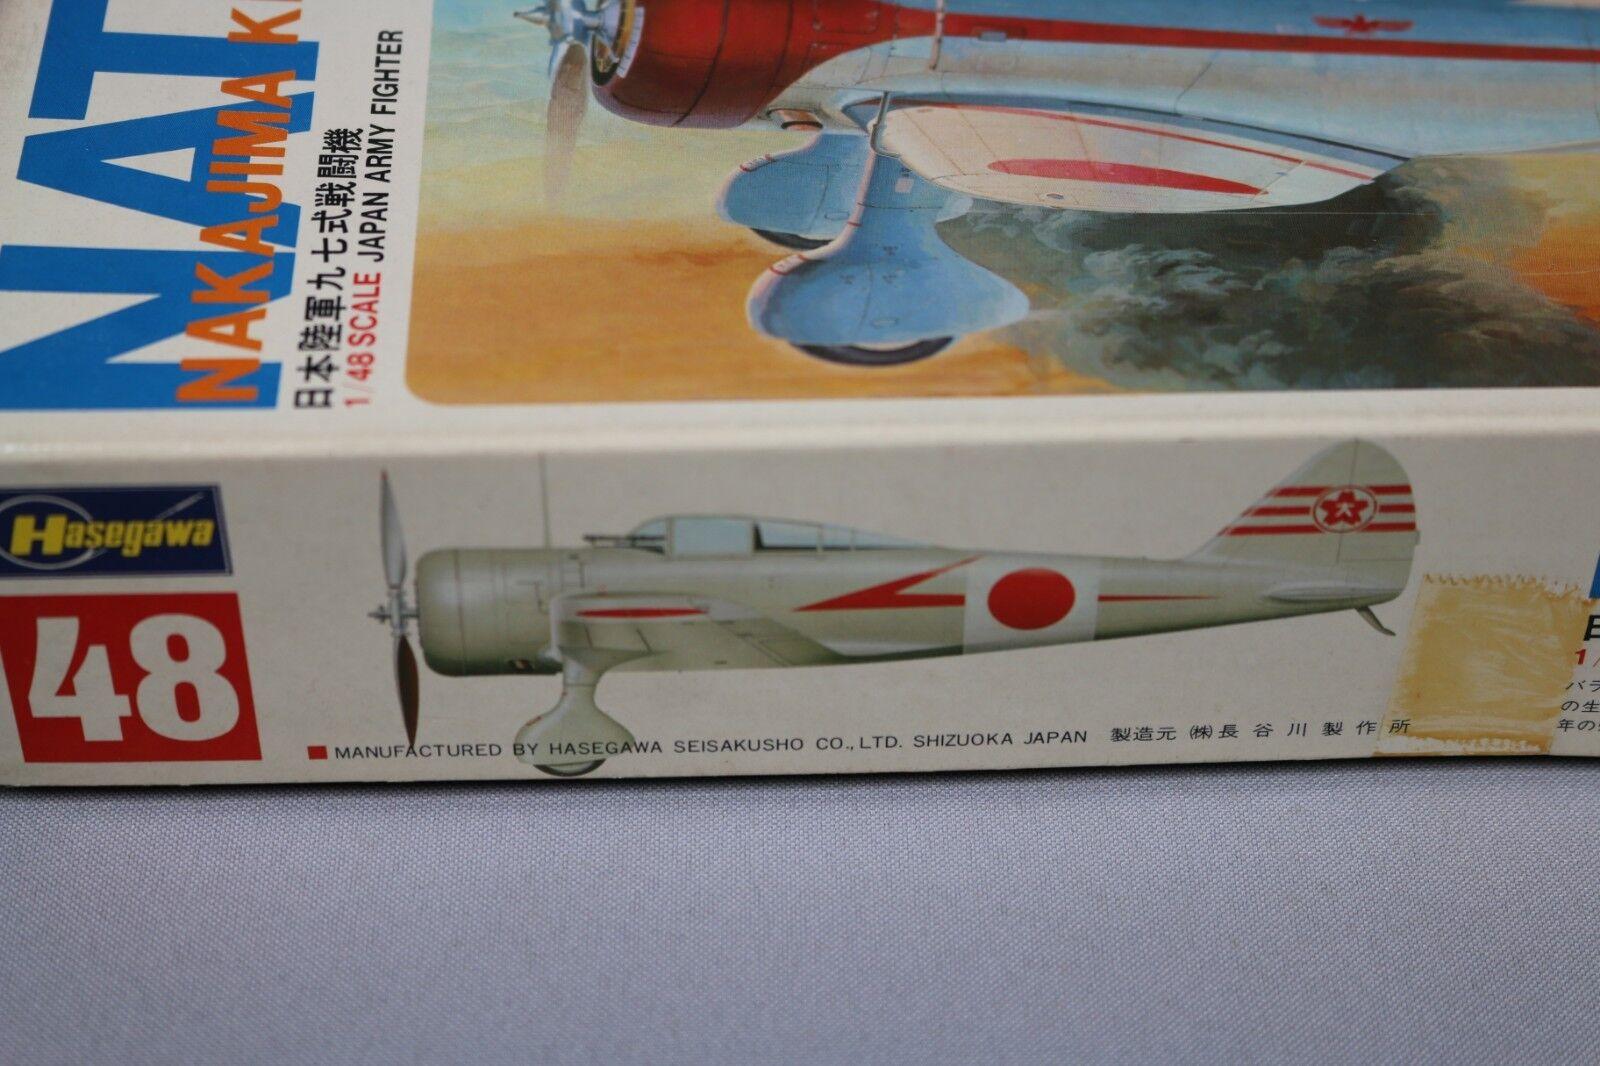 Zf082 Hasegawa 1 48 Modell Modell Modell Flugzeug 48 U001   700 Nate Nakajima Ki27 Japan Edl 4122be